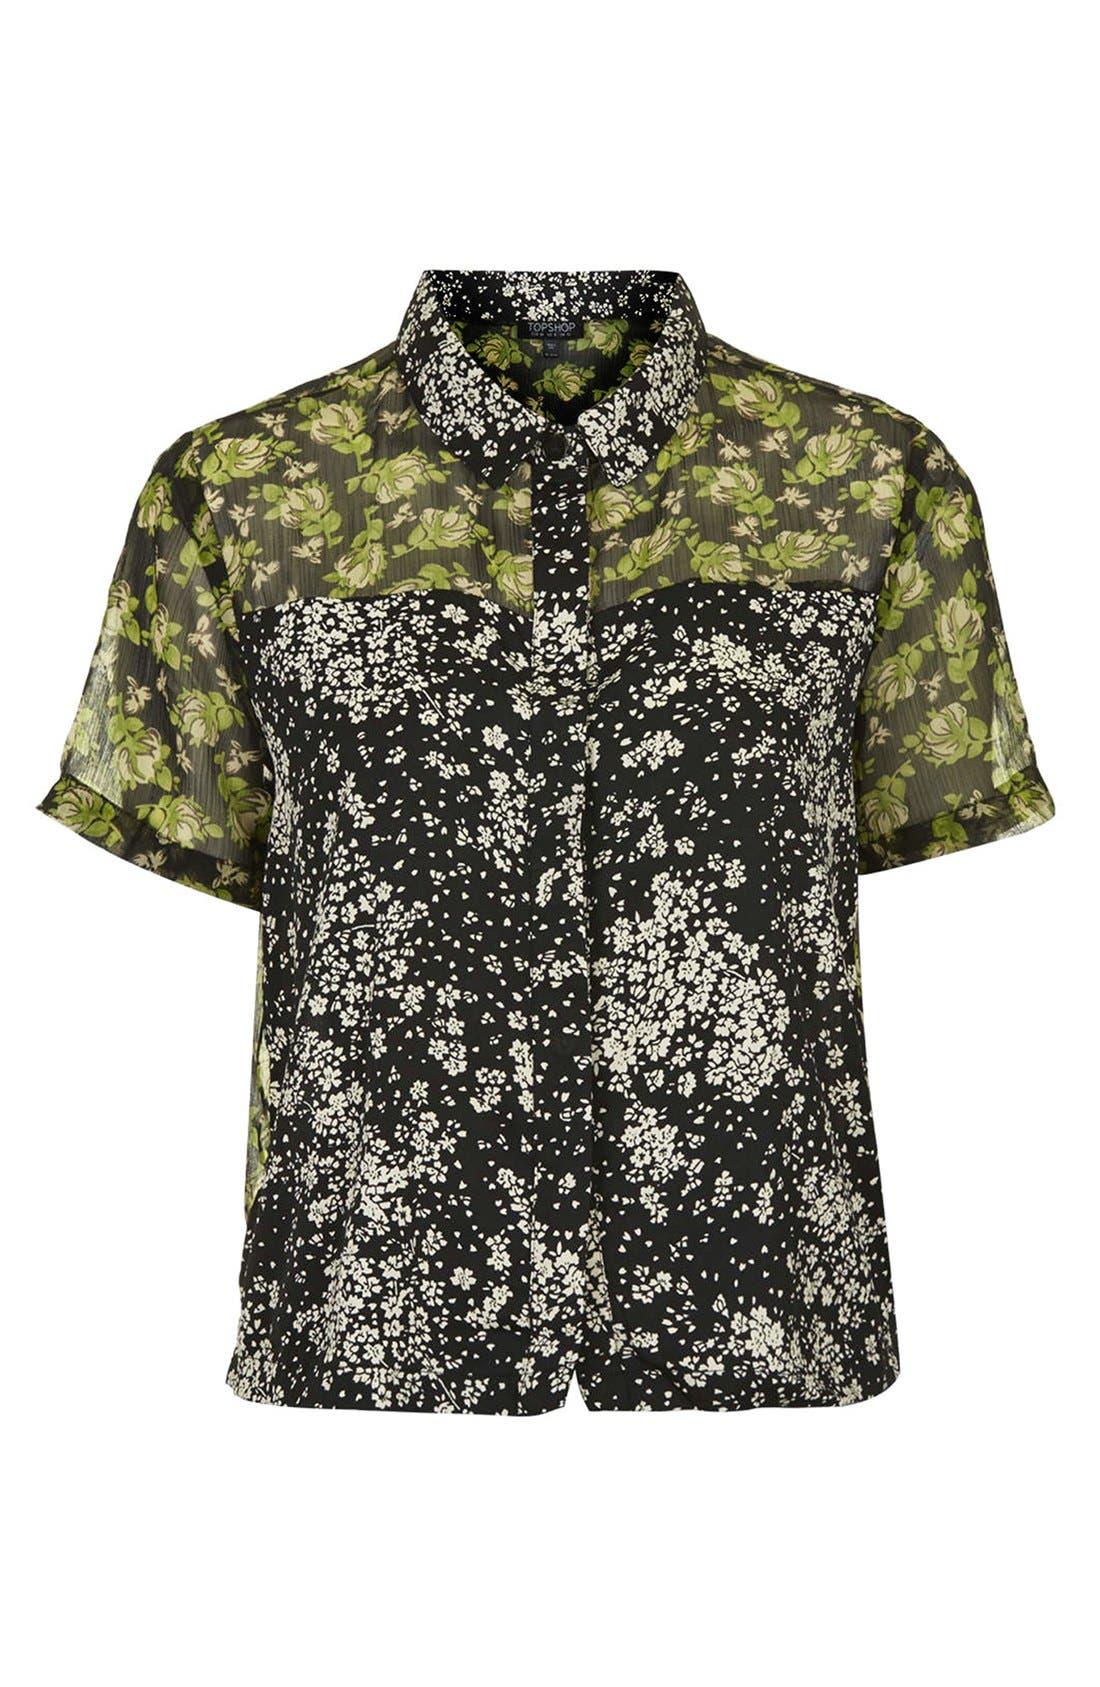 Alternate Image 3  - Topshop Reclaim To Wear Mix Print Shirt